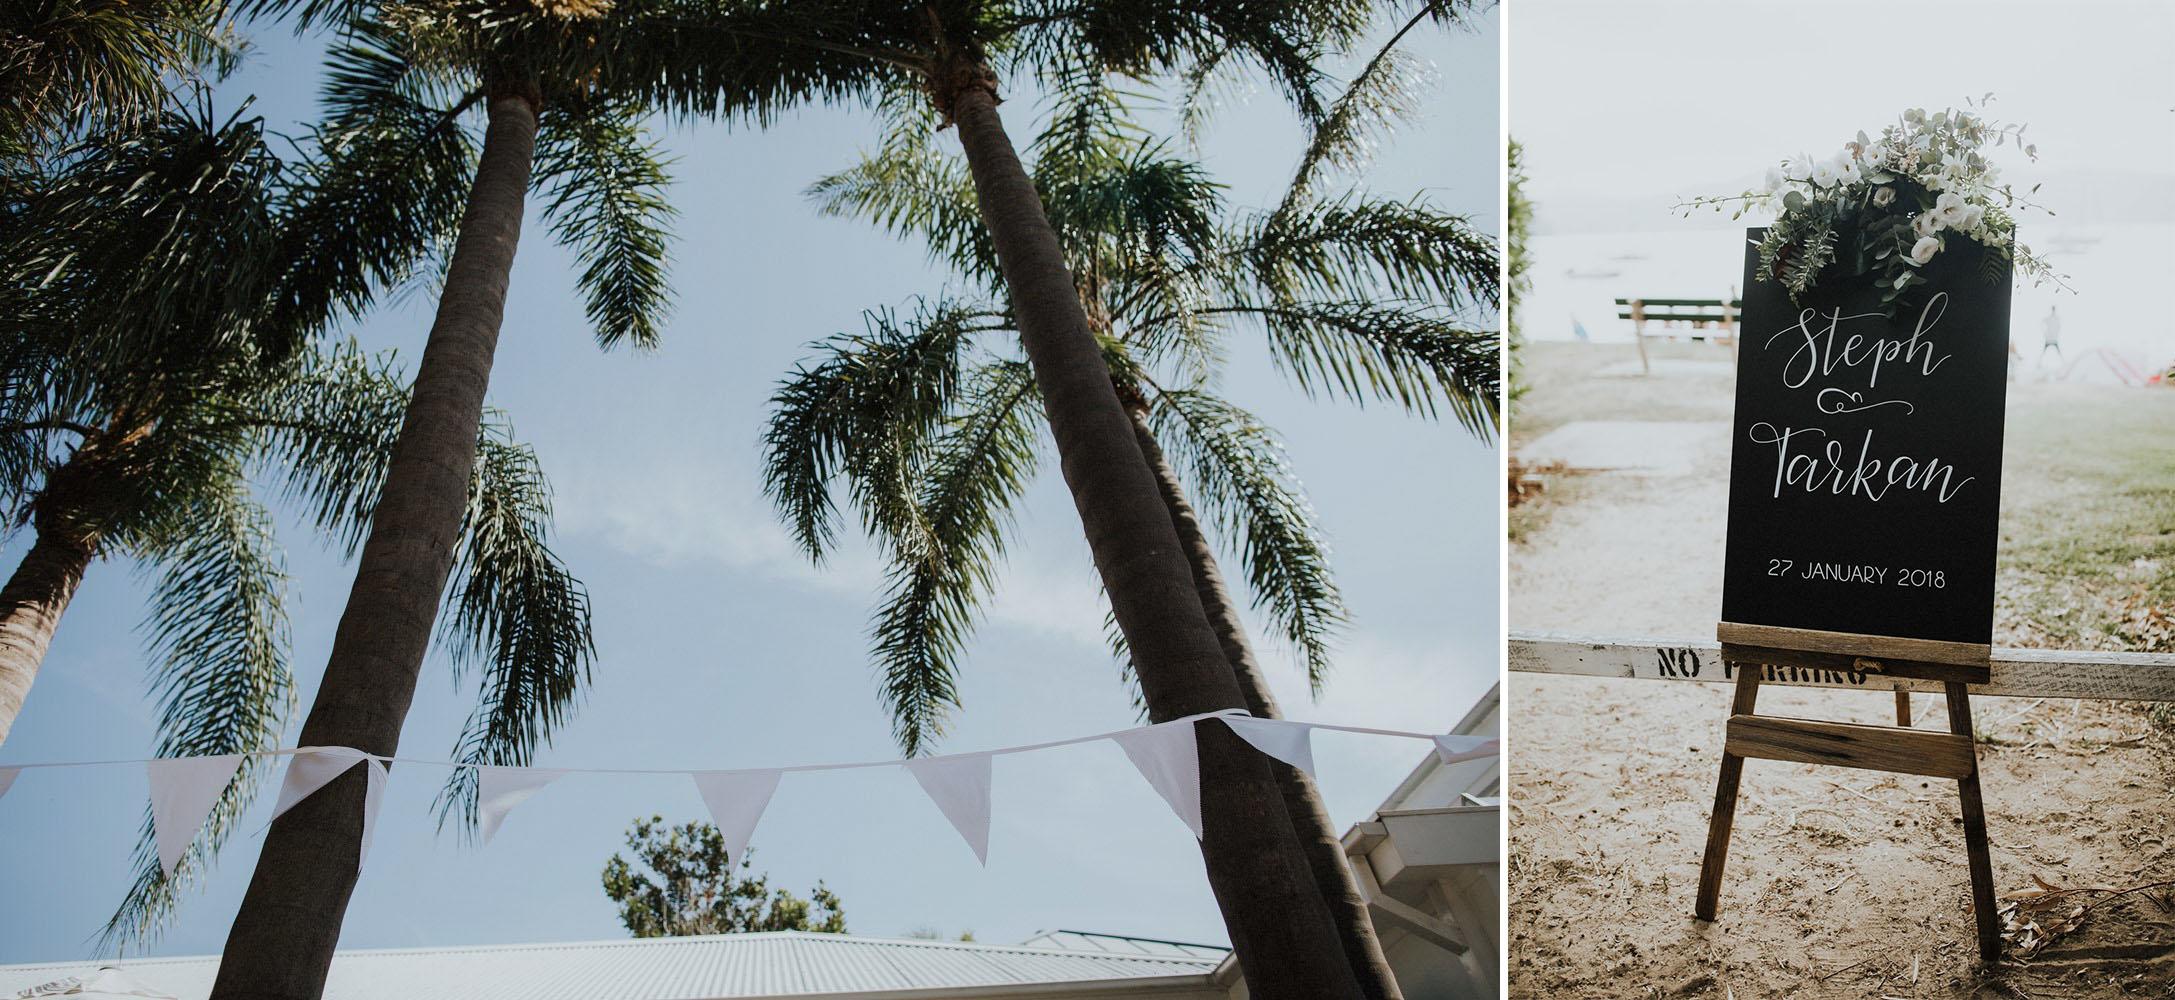 the-boat-house-palm-beach-wedding_031(8435)2.jpg